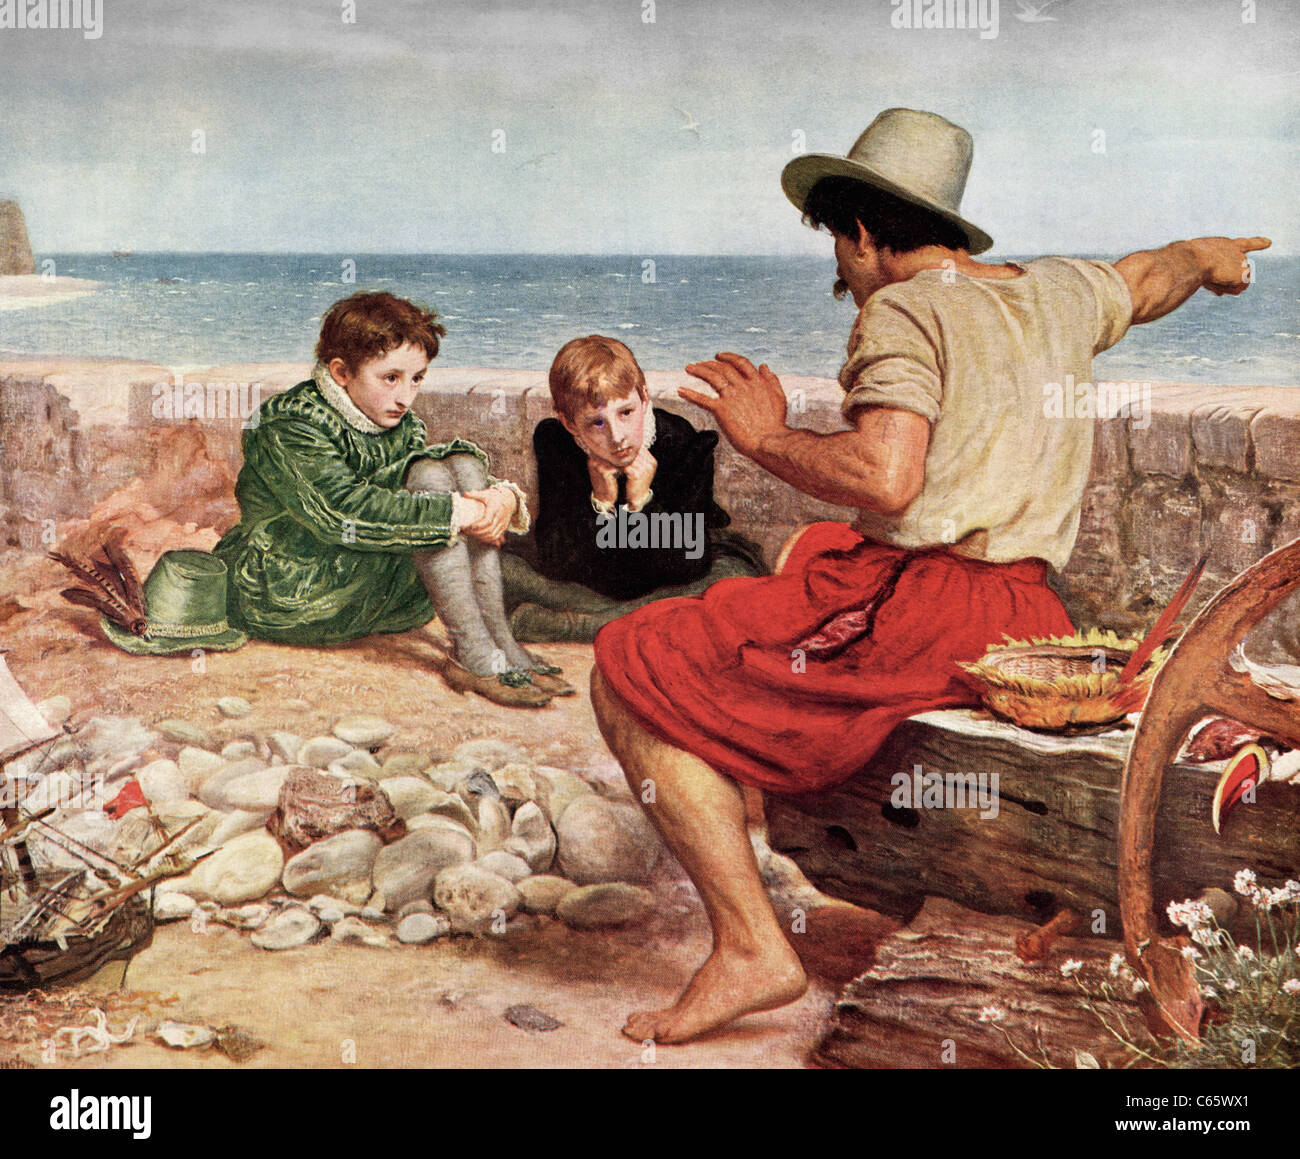 The Boyhood of Raleigh by Sir John Everett Millais. - Stock Image